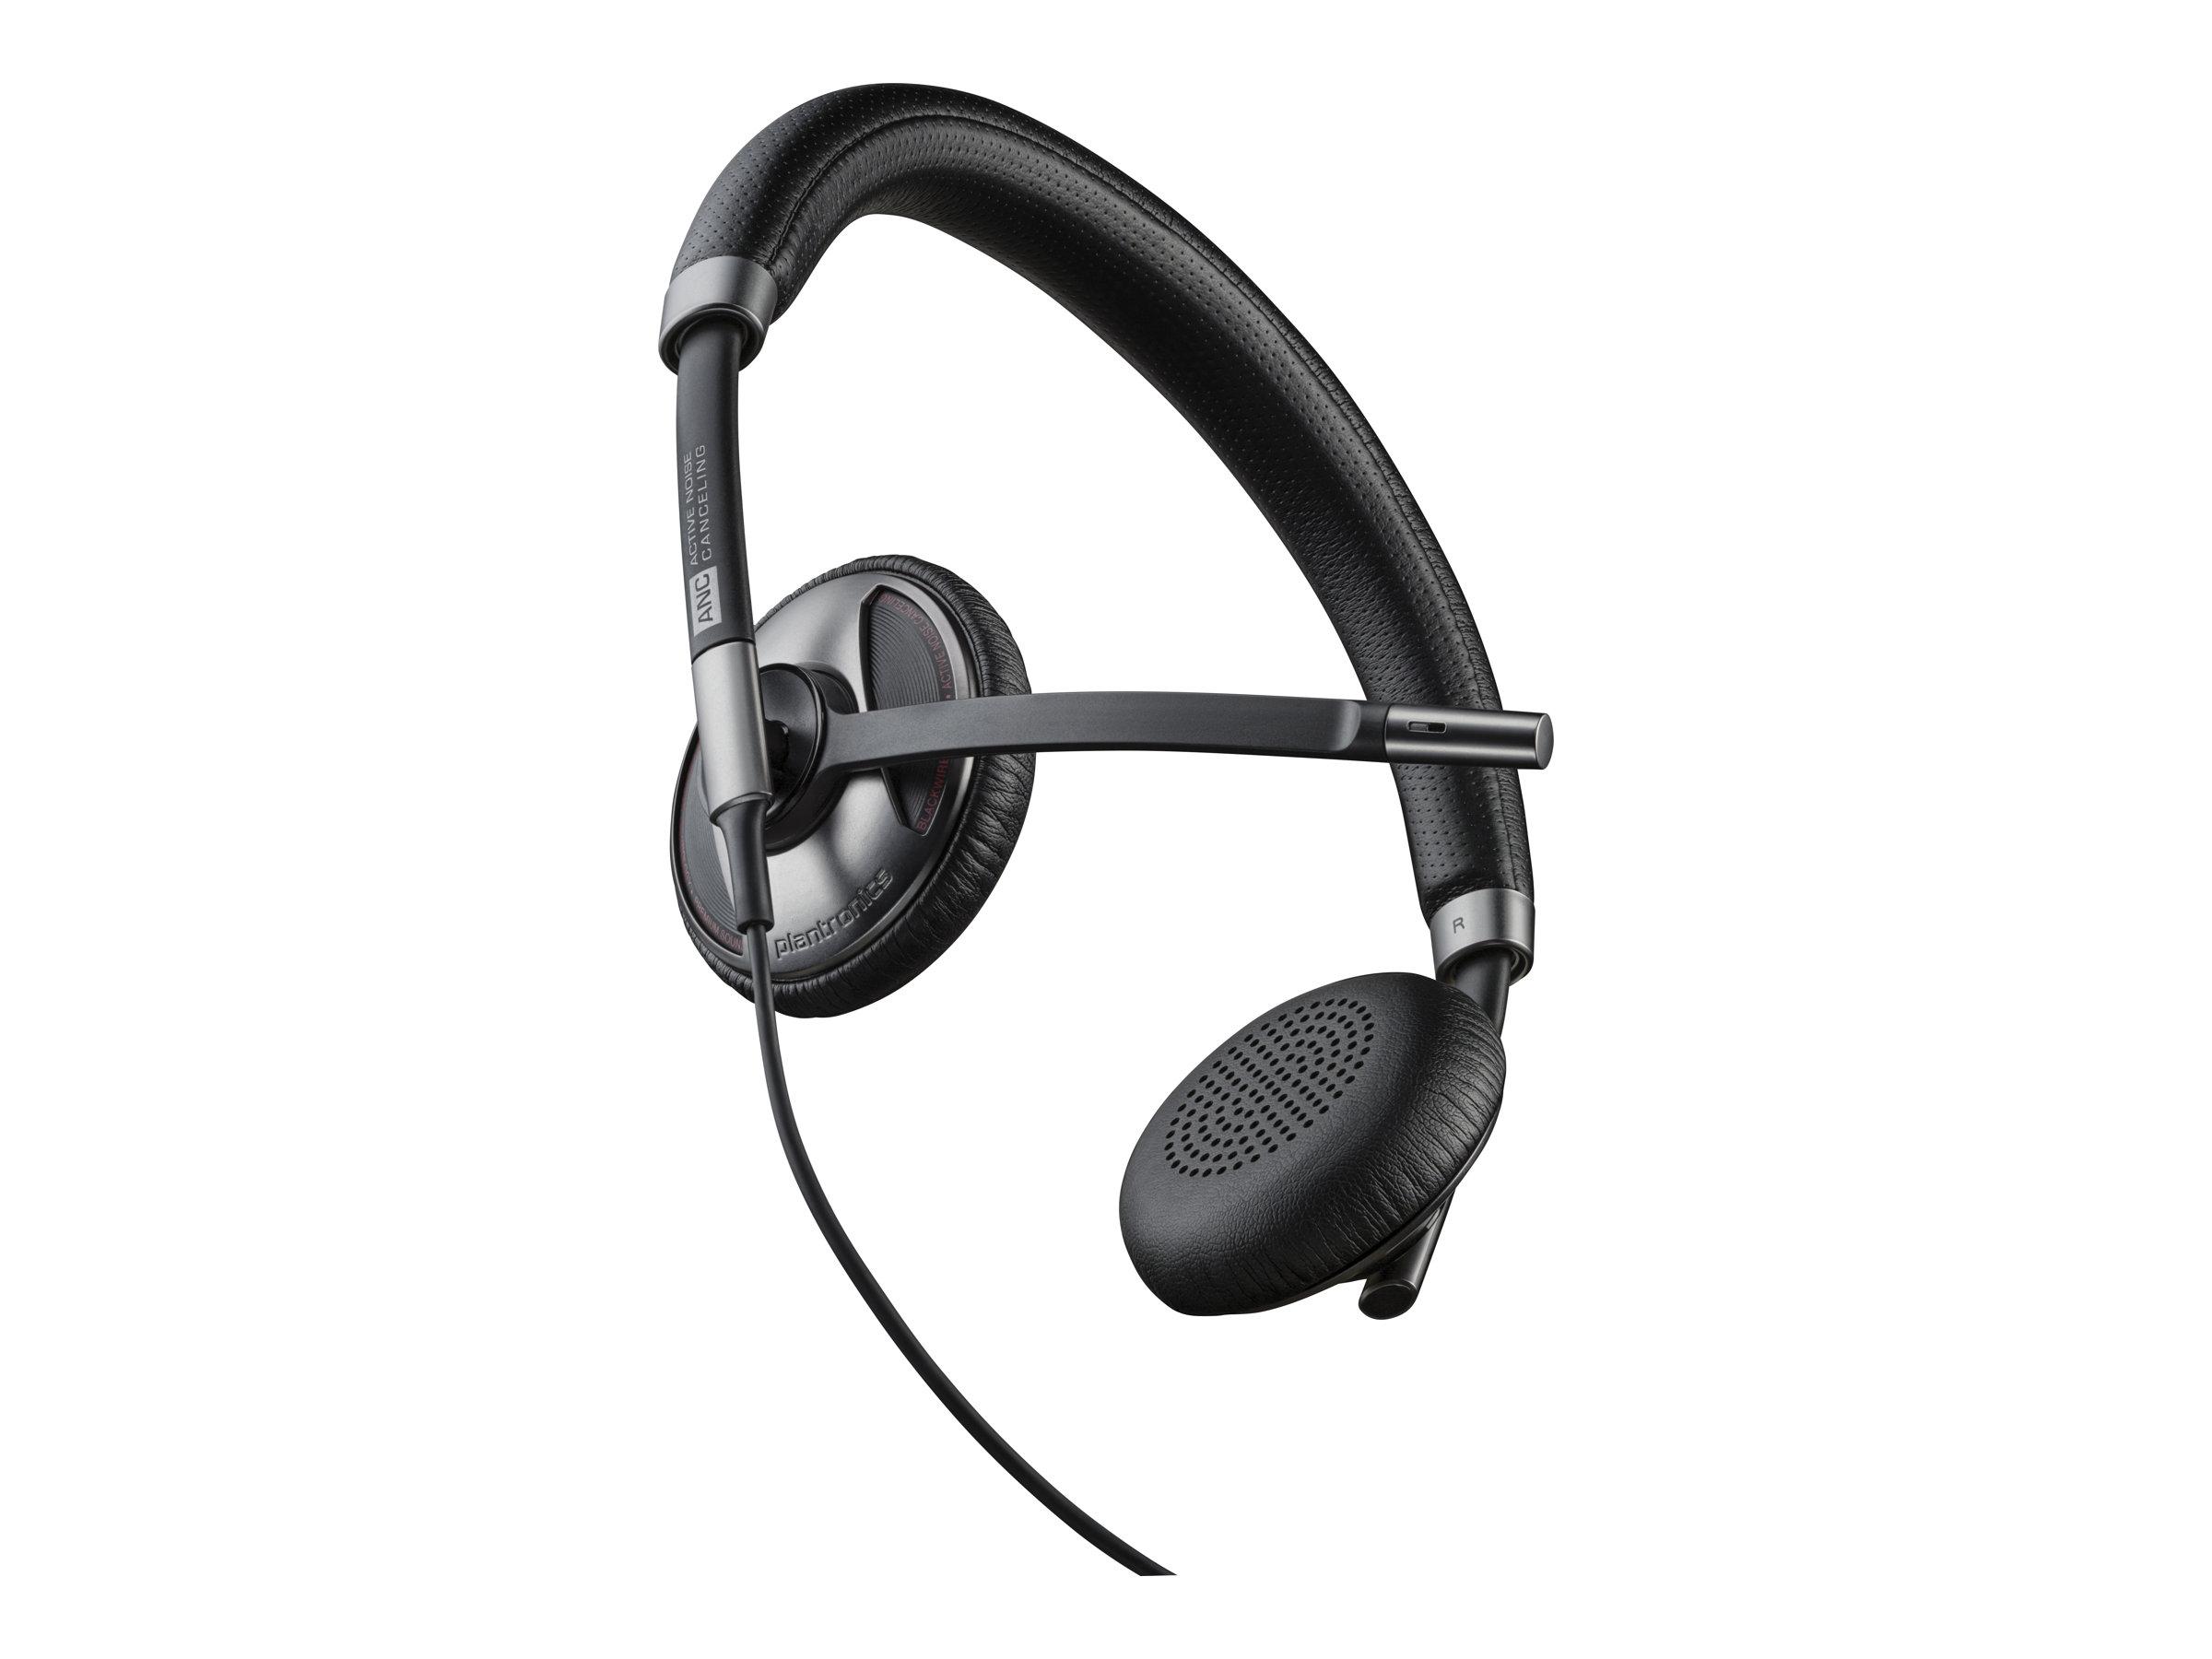 Plantronics Blackwire C725 - 700 Series - Headset - On-Ear - kabelgebunden - aktive Rauschunterdrückung